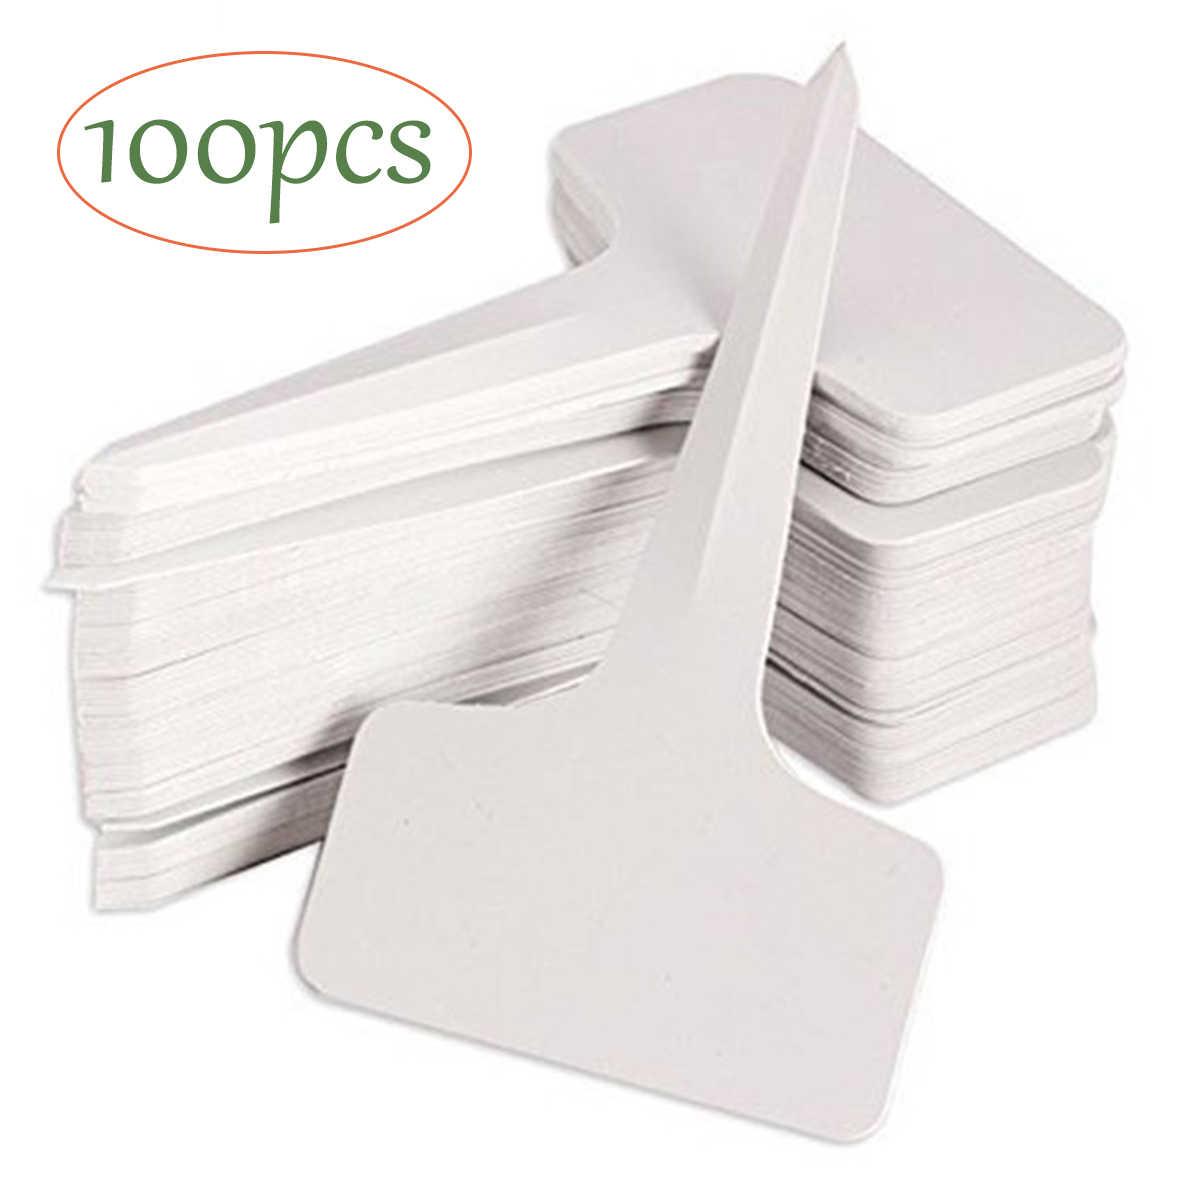 10Pcs Plastic T-Type Name Tags Plant Labels Nursery Garden Markers Sticks